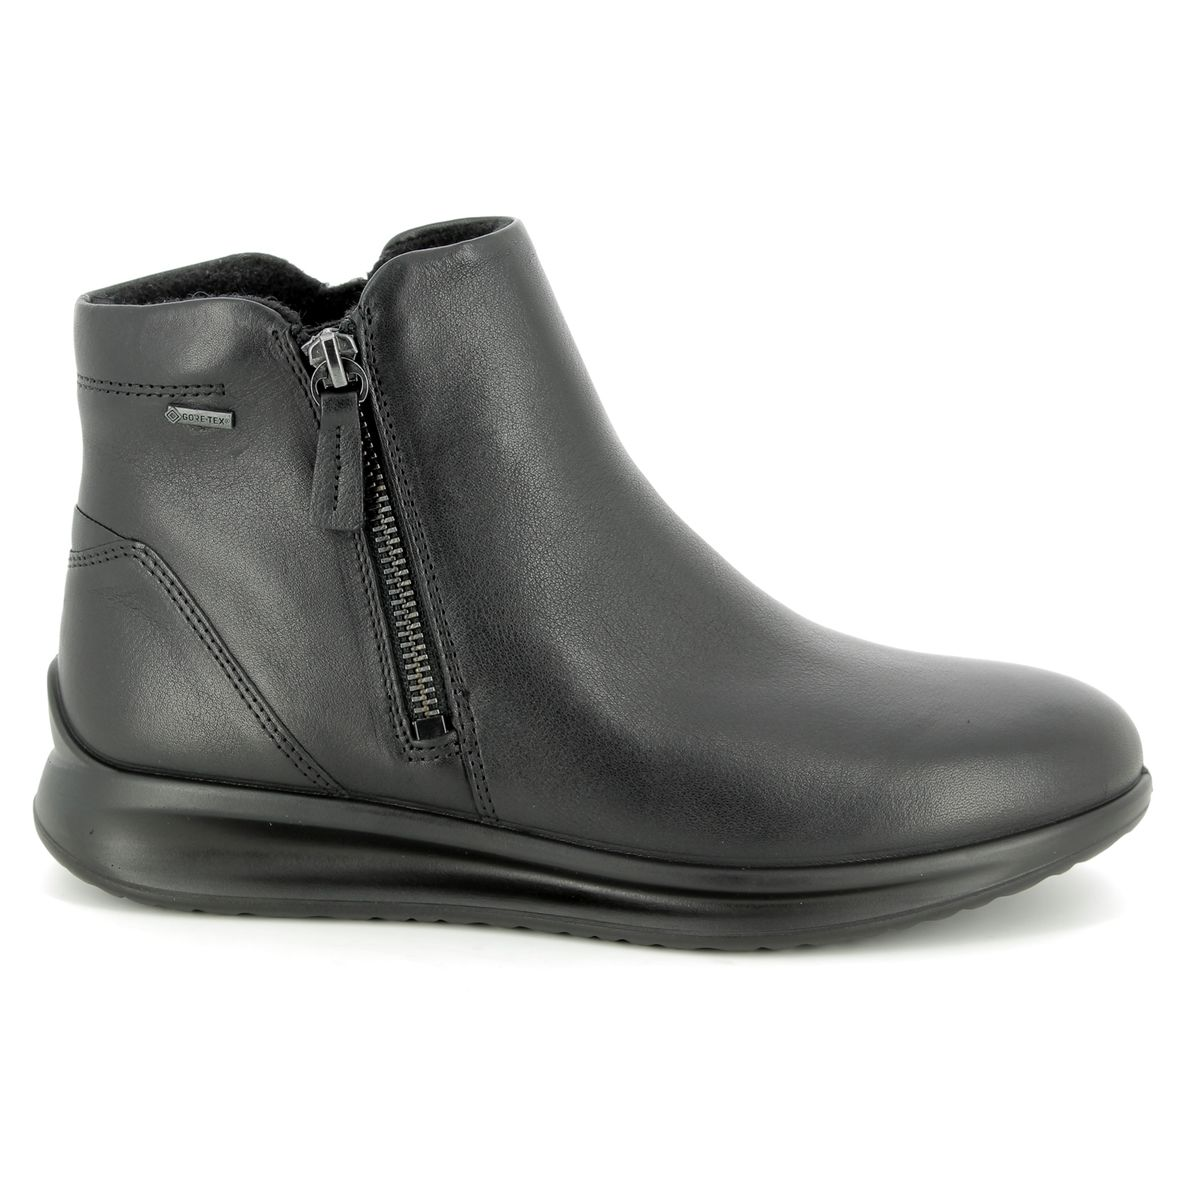 9d4308b2 ECCO Ankle Boots - Black leather - 207083/01001 AQUET ZIP GORE-TEX